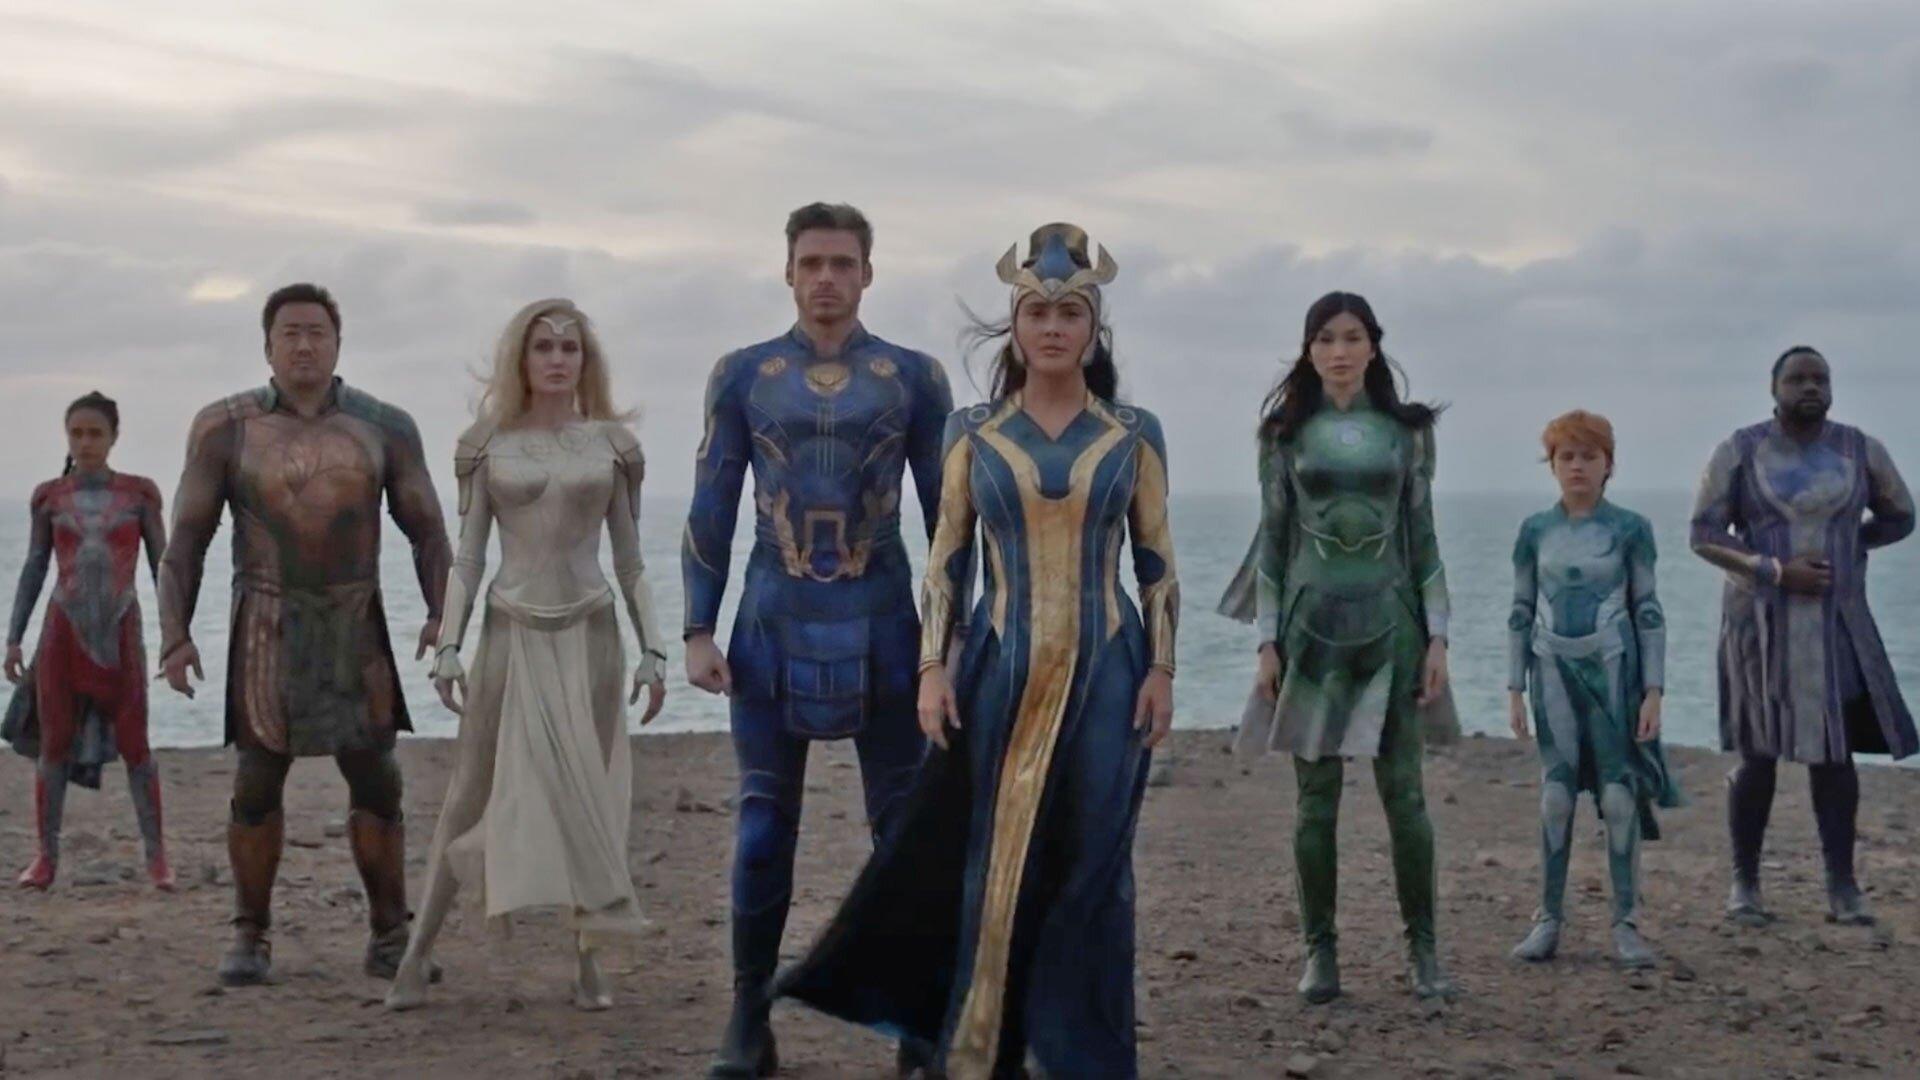 The cast of Marvel's Eternals movie including Richard Madden, Salma Hayek and Gemma Chan